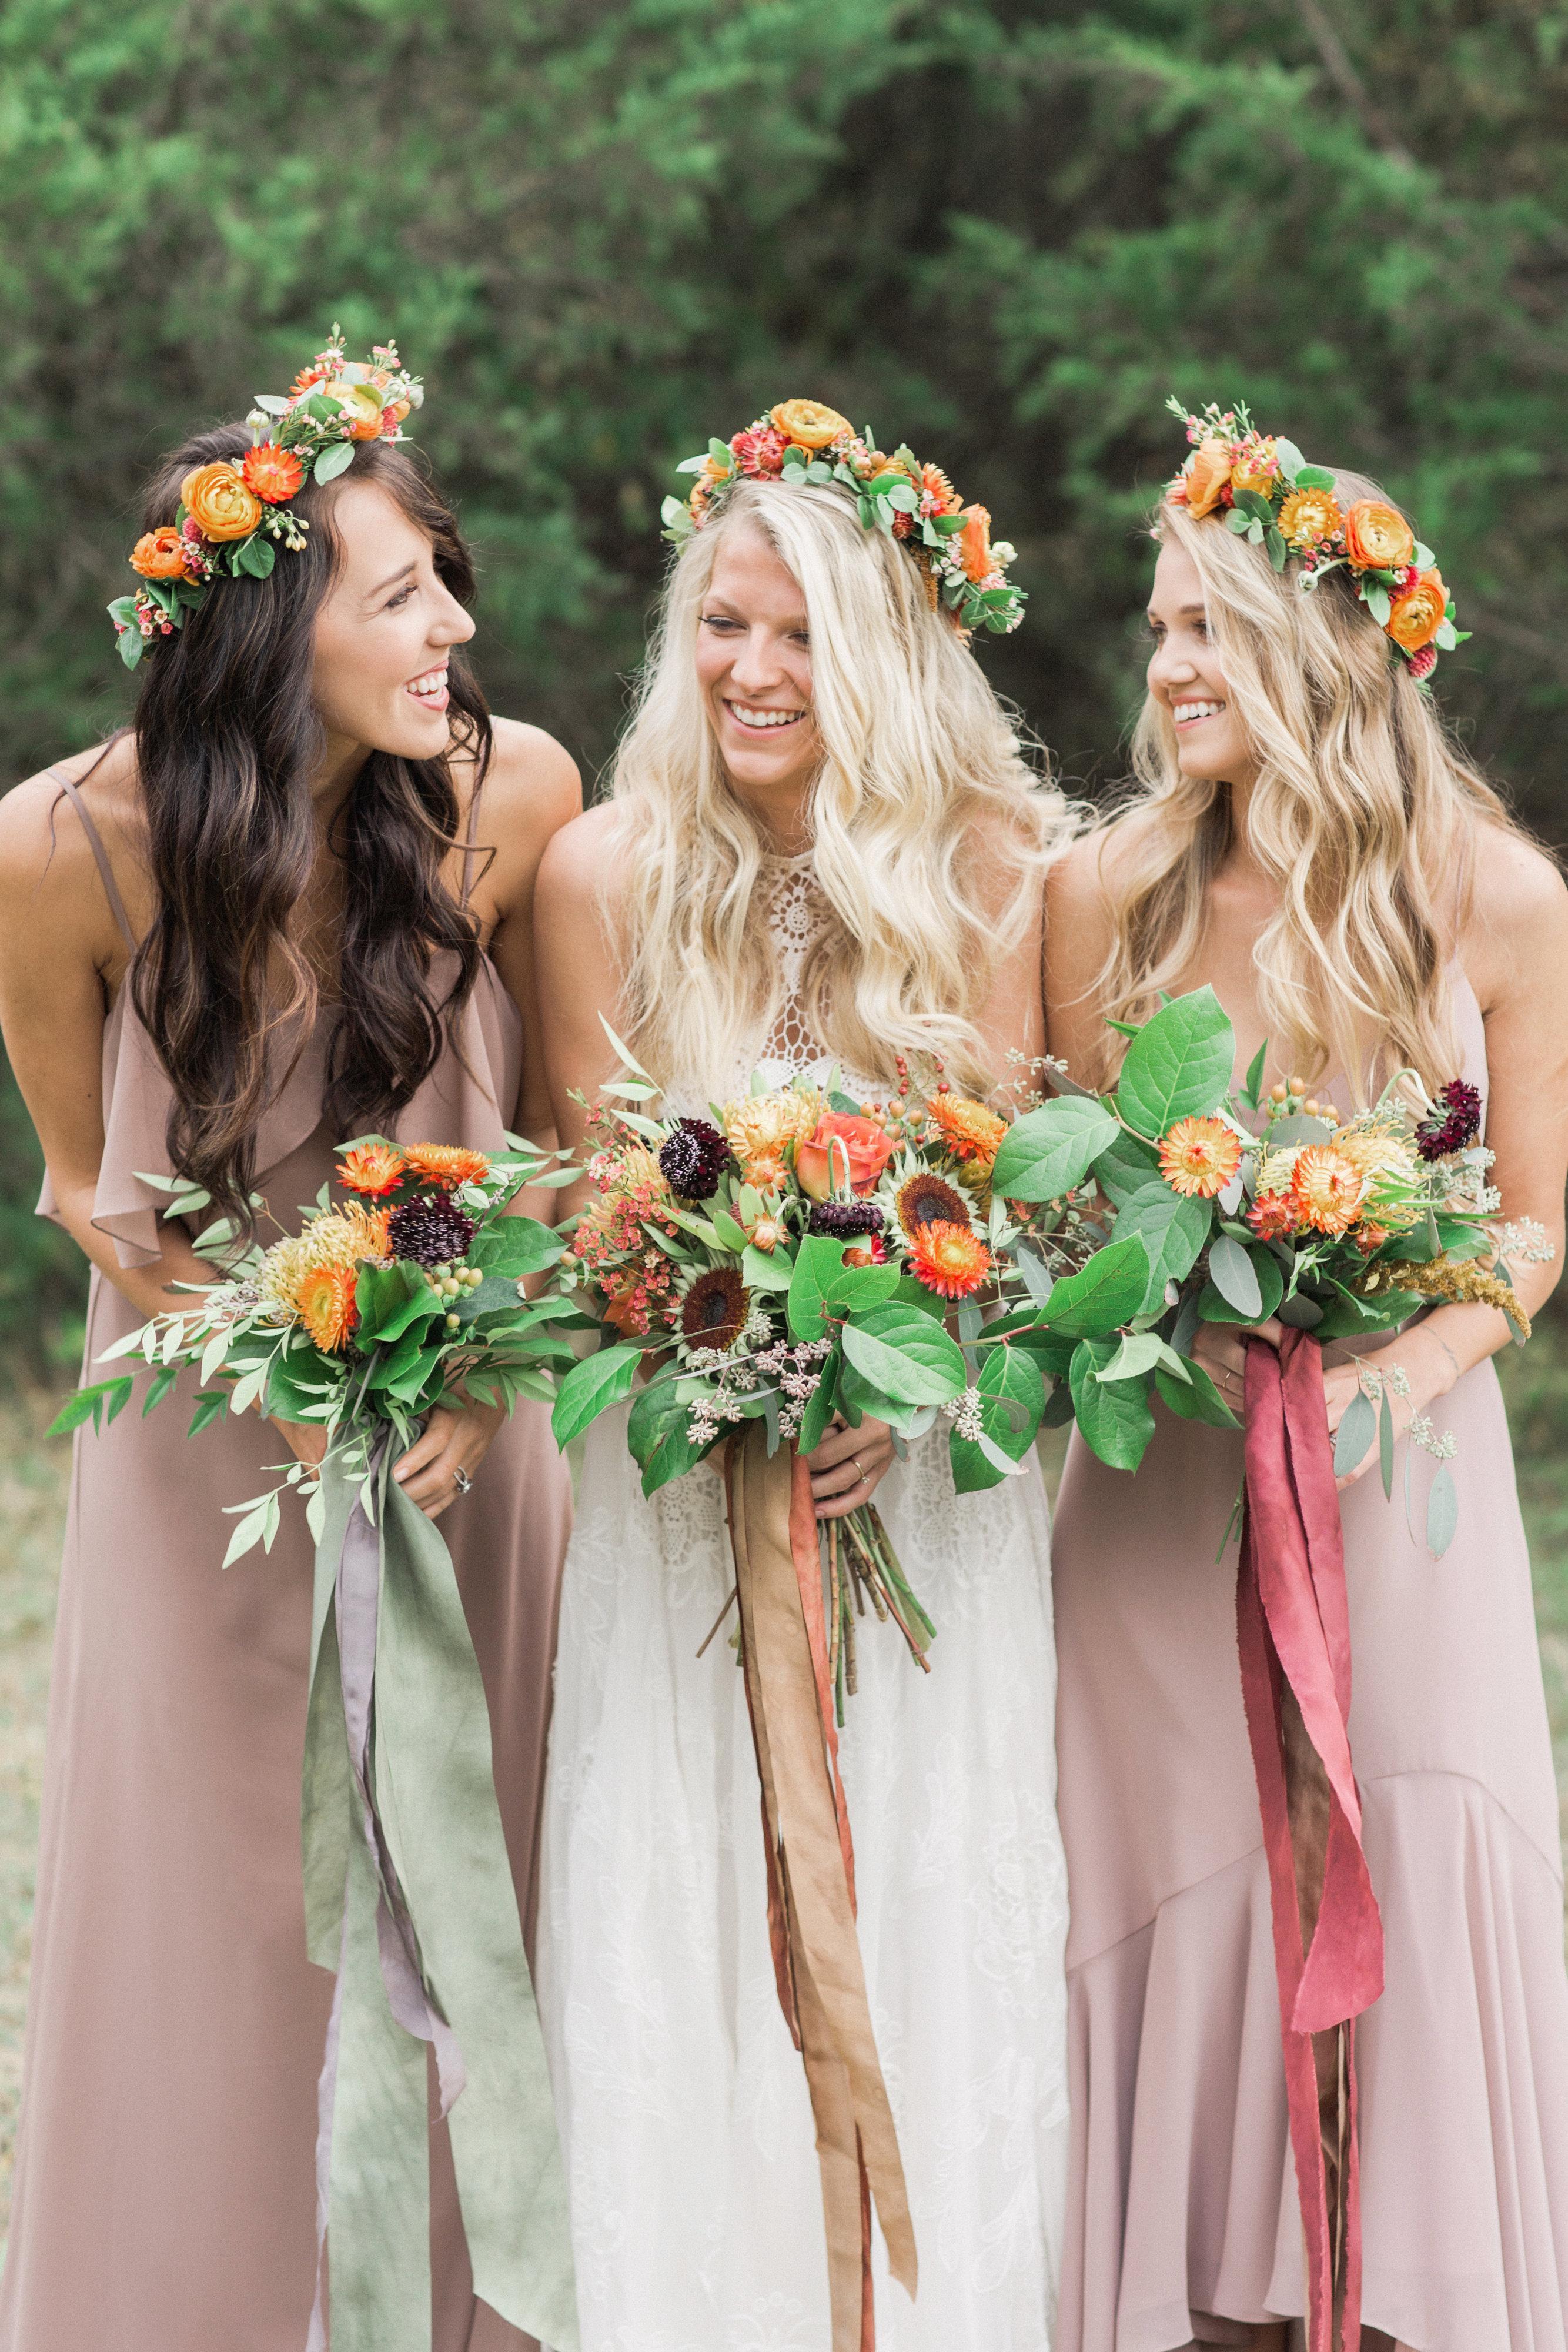 Fall Bohemian Bridesmaid Party Inspiration - TrueBlu ...